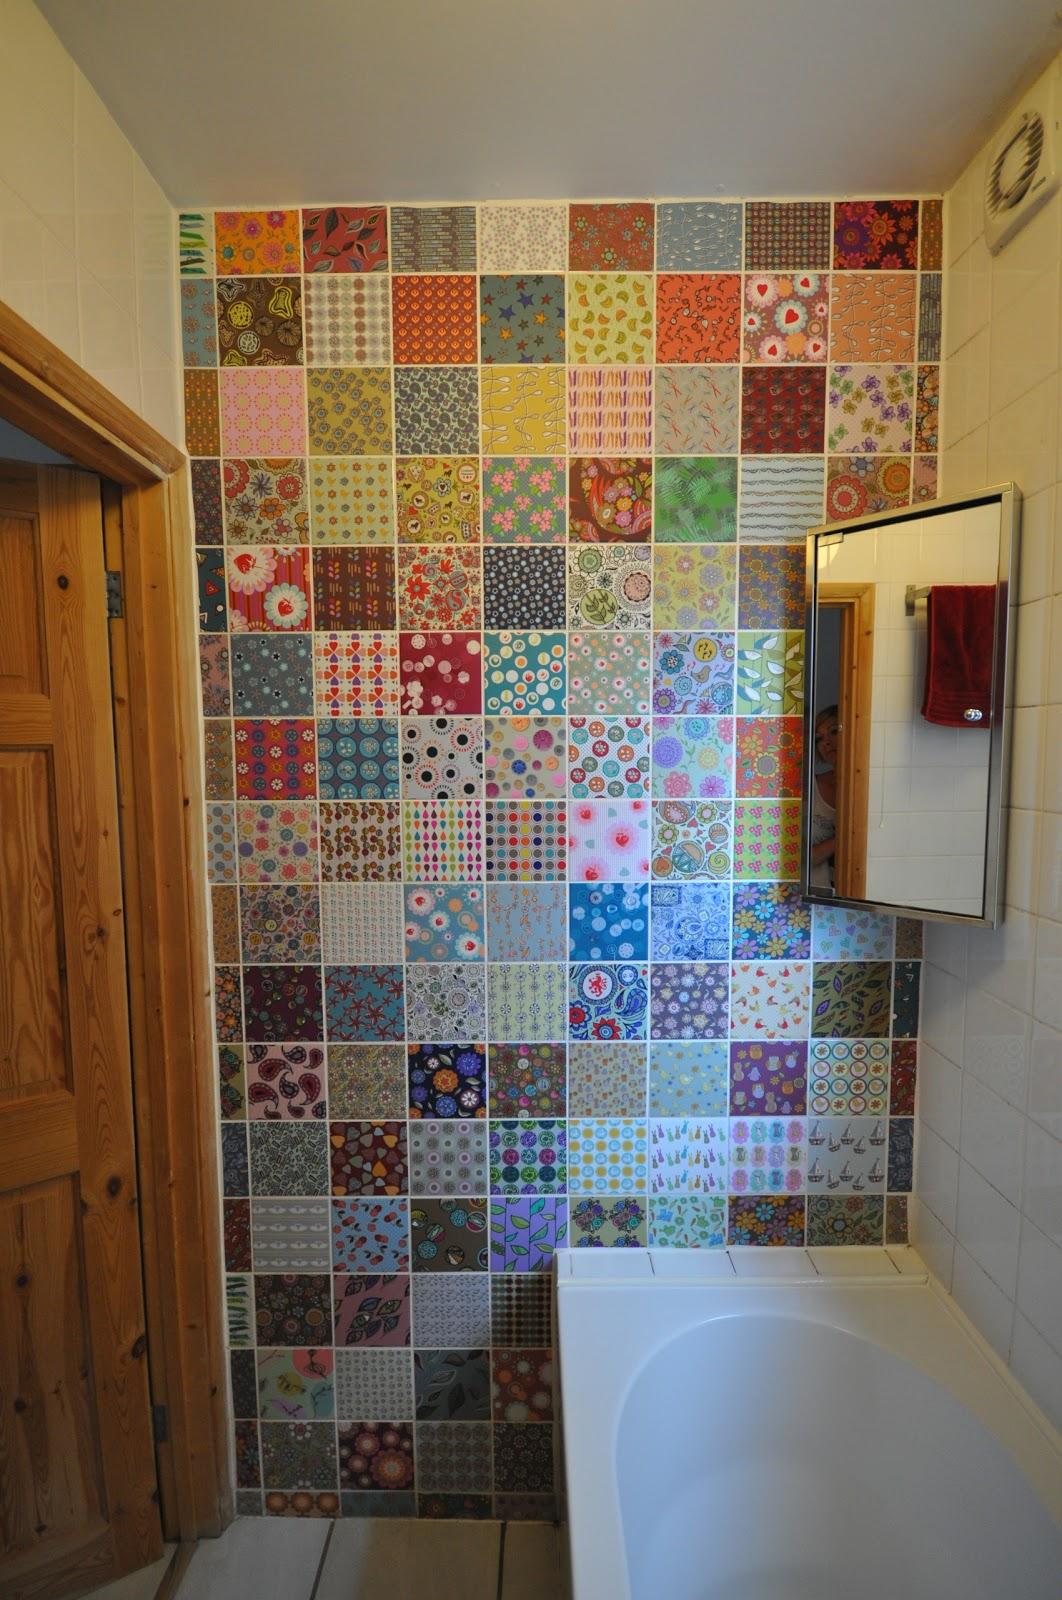 Georgia Coote: Adam's Tile Wall